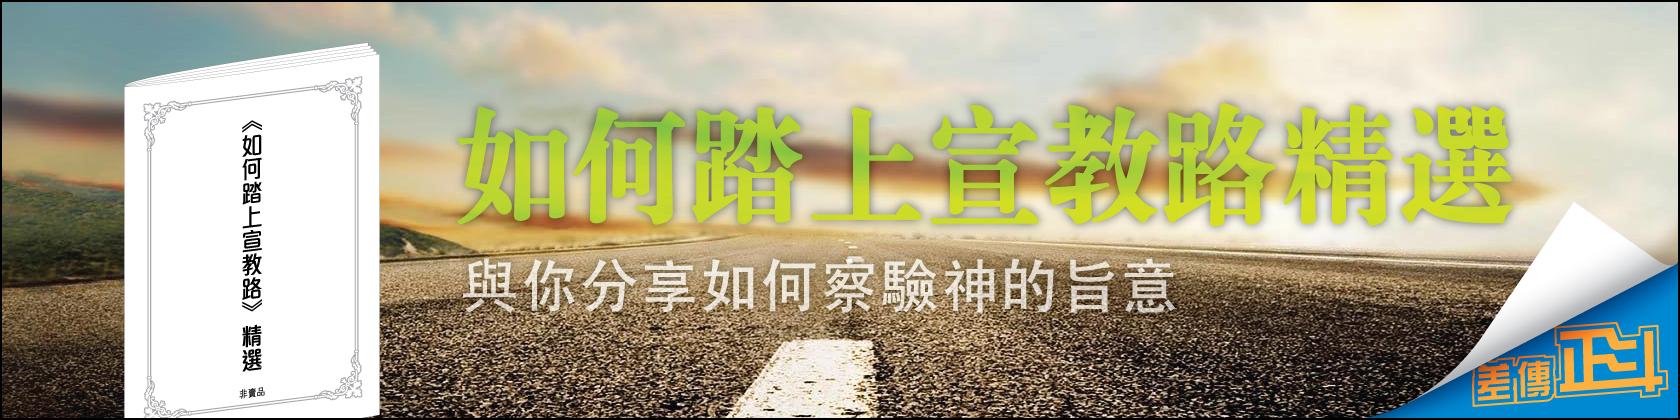 CB-01-web-banner-1680-x-420-B2-06